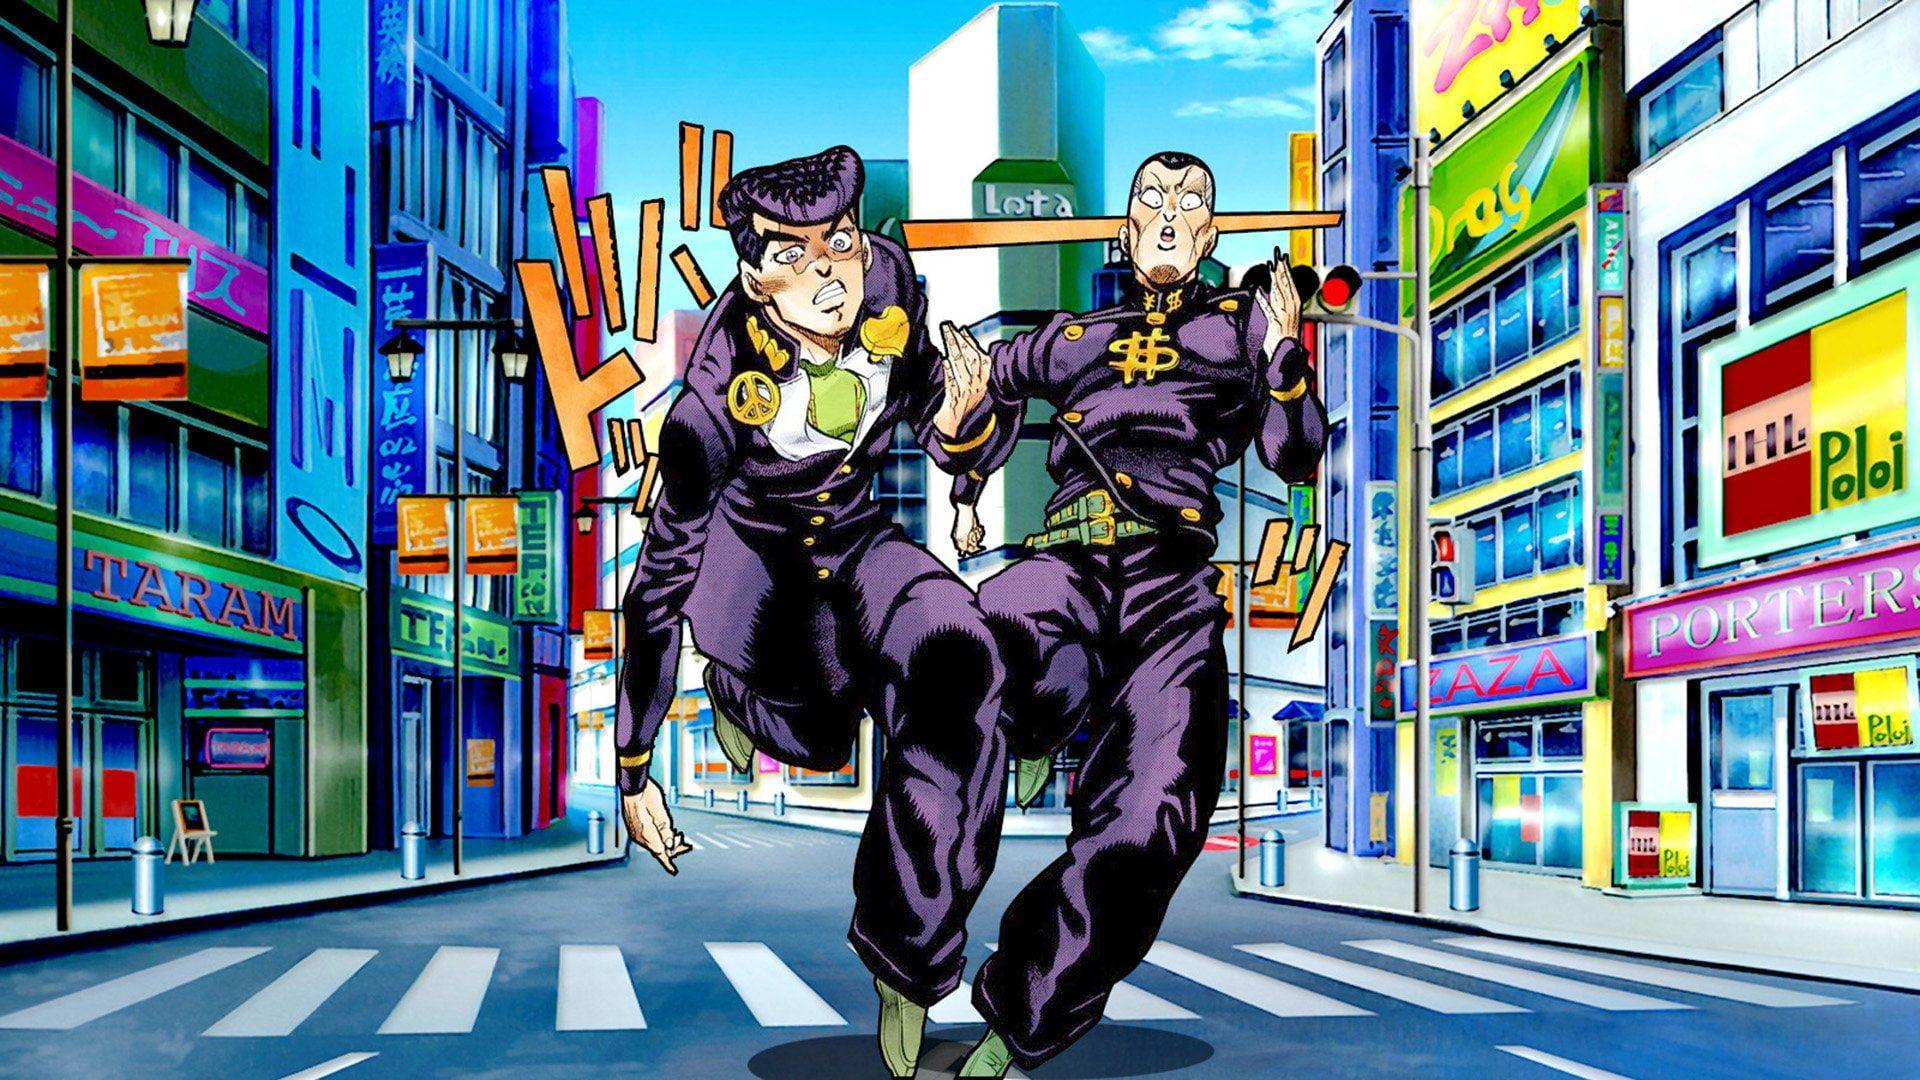 Anime Jojo S Bizarre Adventure Josuke Higashikata Okuyasu Nijimura 1080p Wallpaper Hdwallpaper Jojo Bizzare Adventure Jojo Bizarre Jojo S Bizarre Adventure